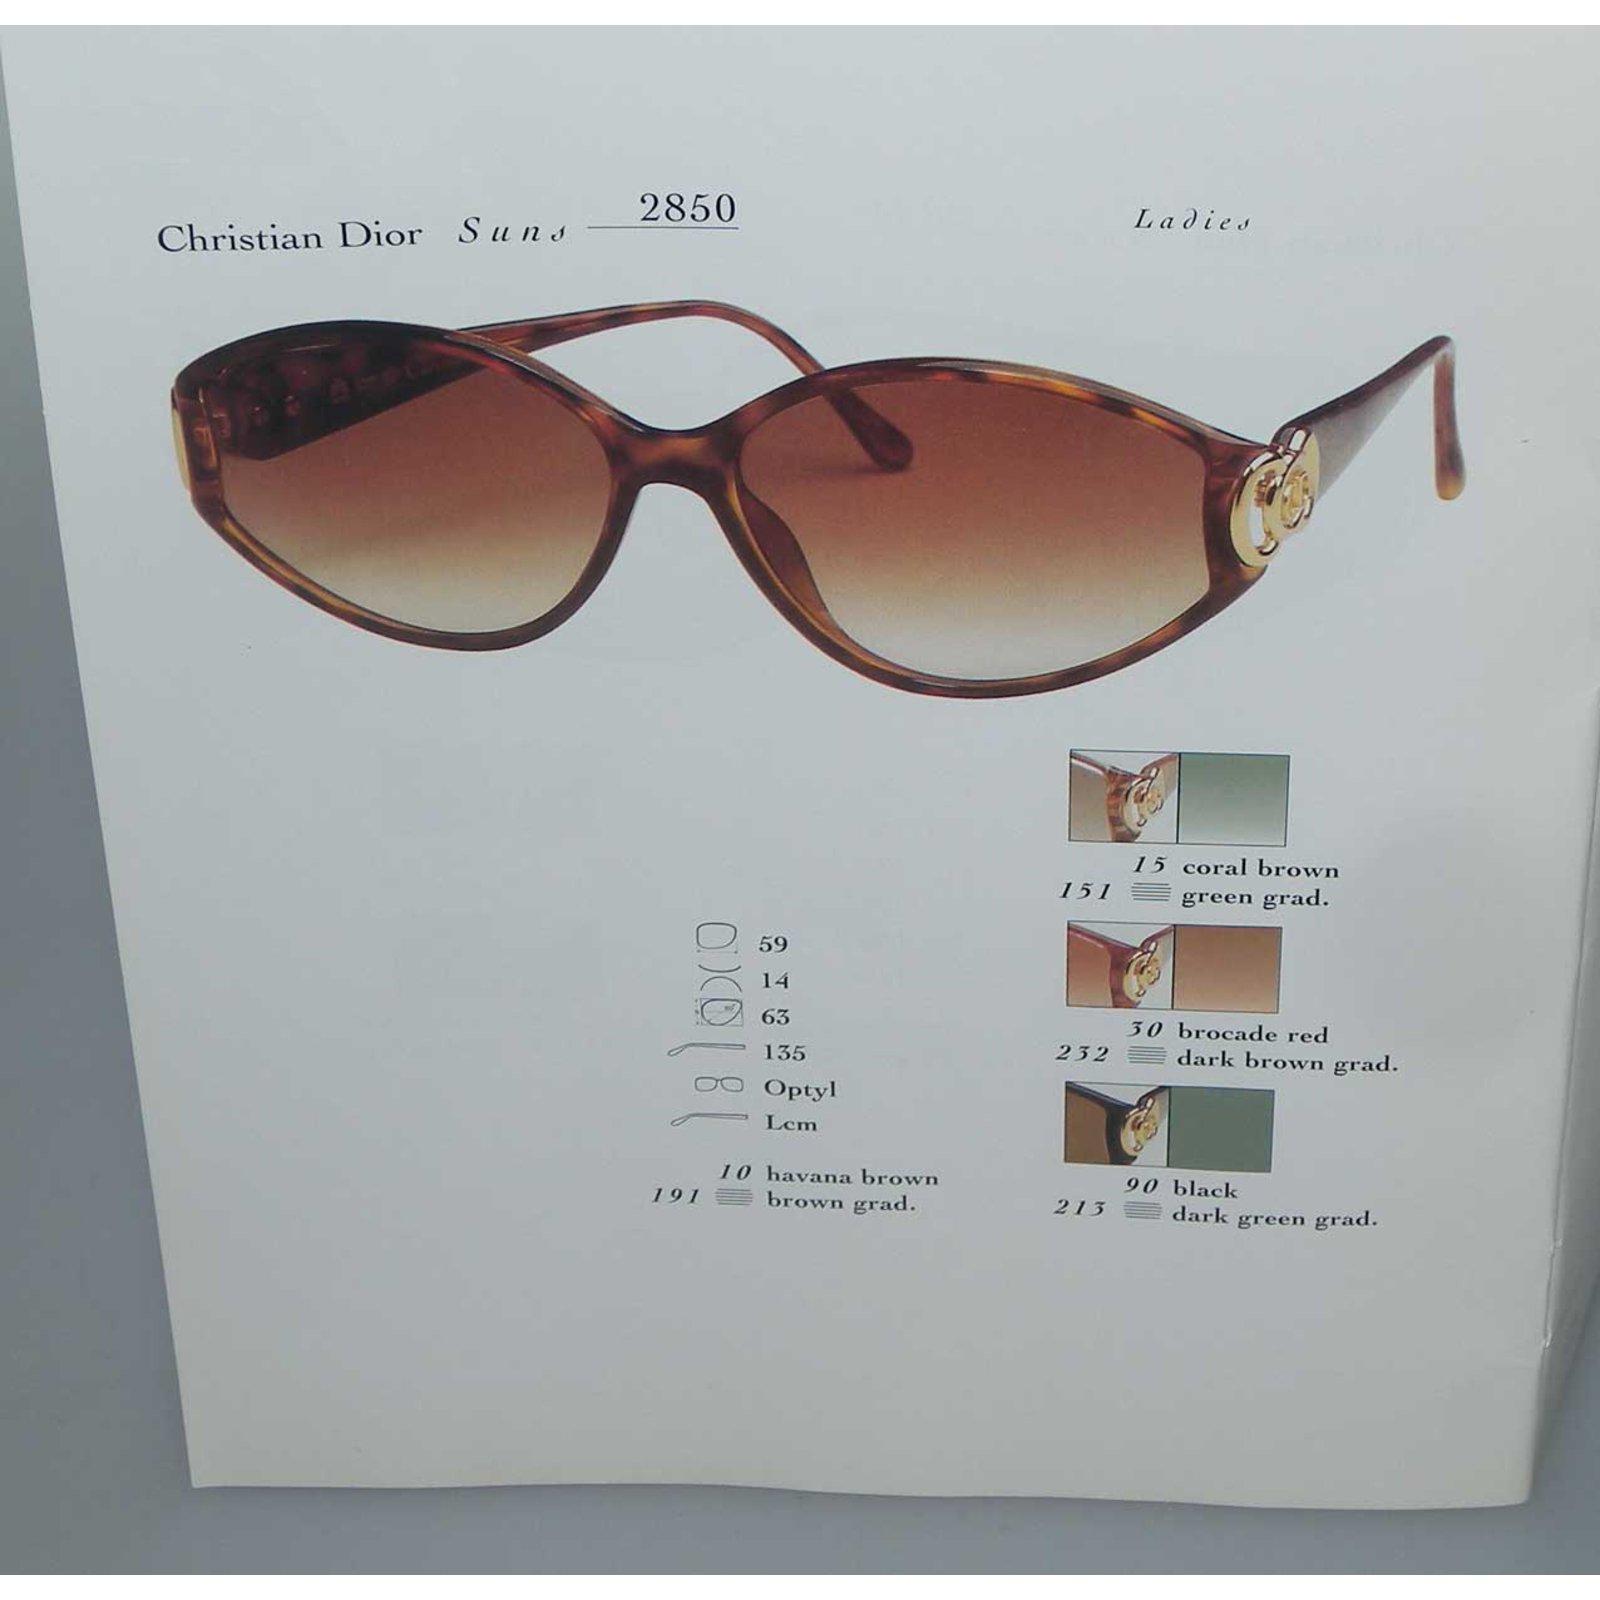 84f176c39b5 Christian Dior Sunglasses Sunglasses Metal